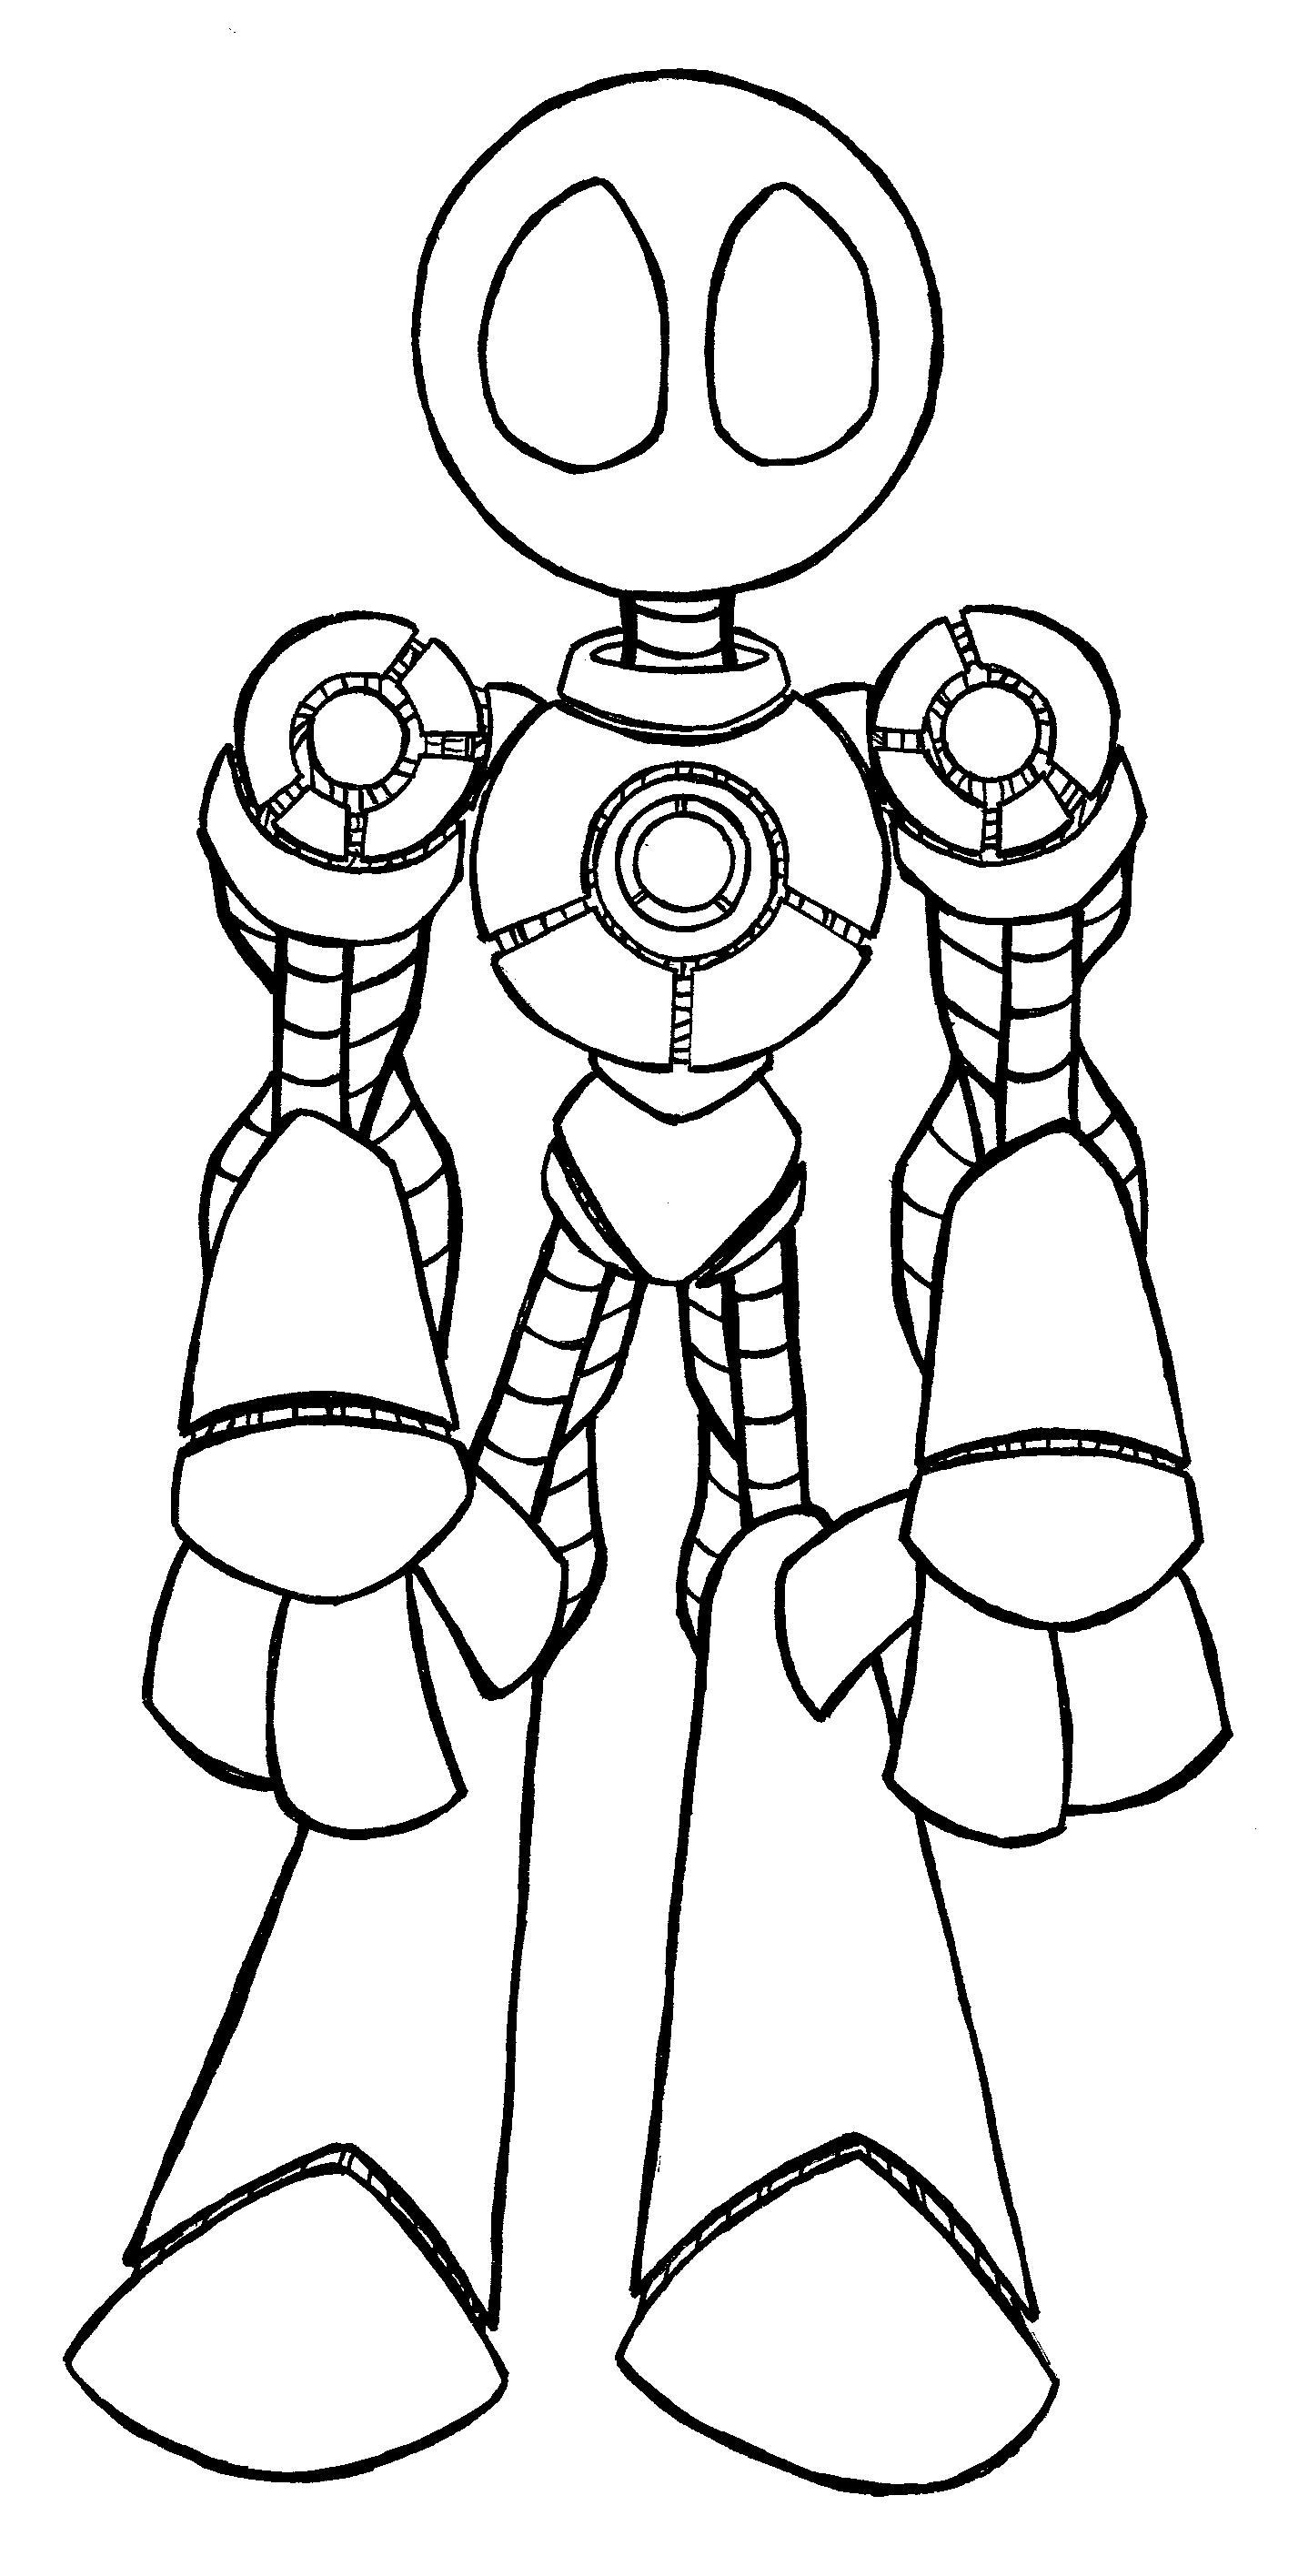 Him,Robot by ChadRocco on DeviantArt